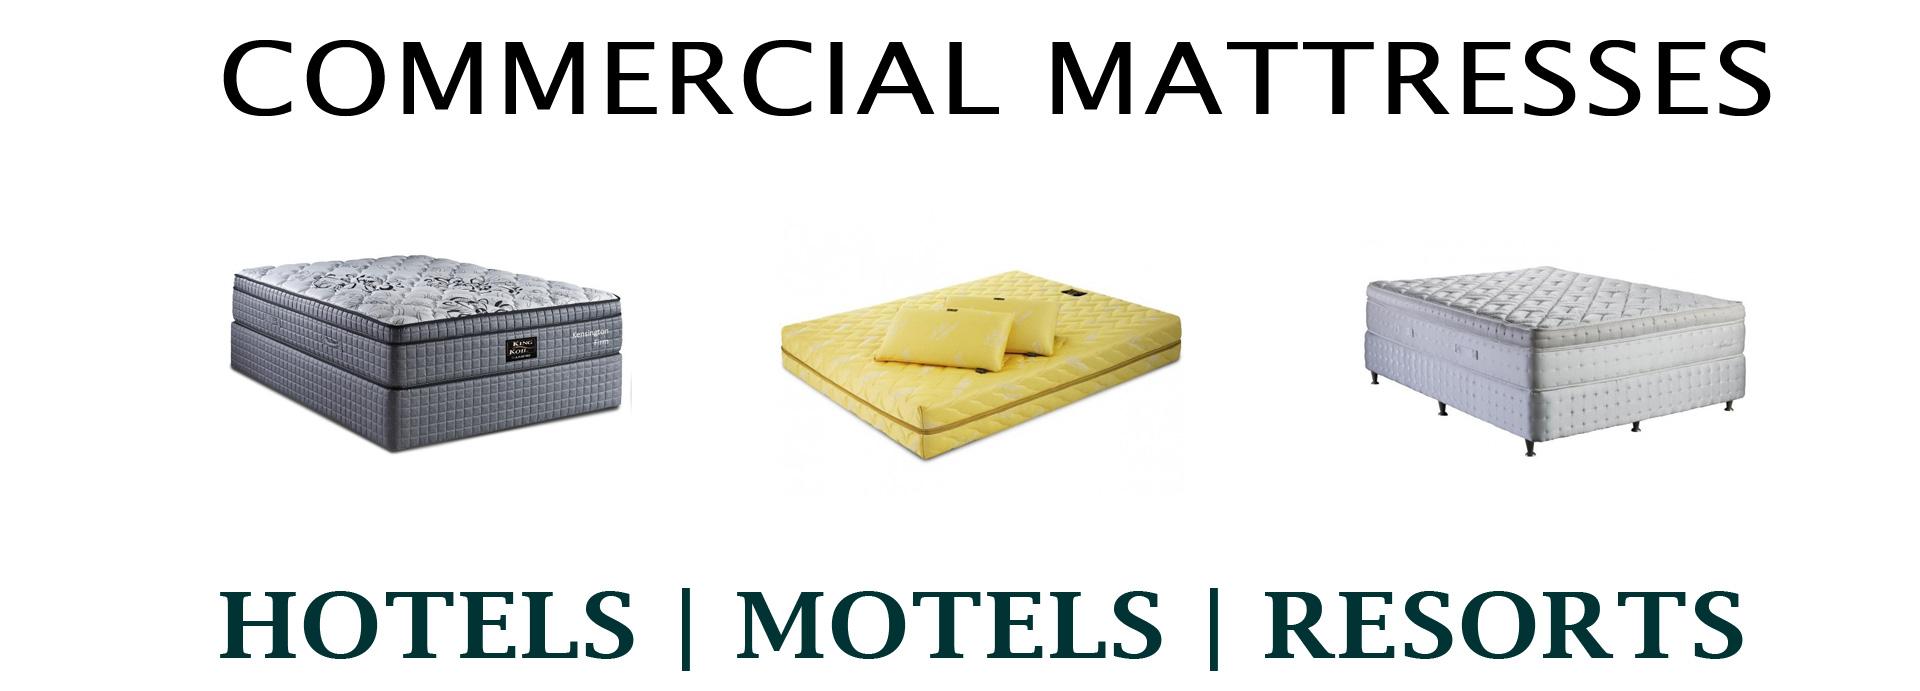 commercial mattresses